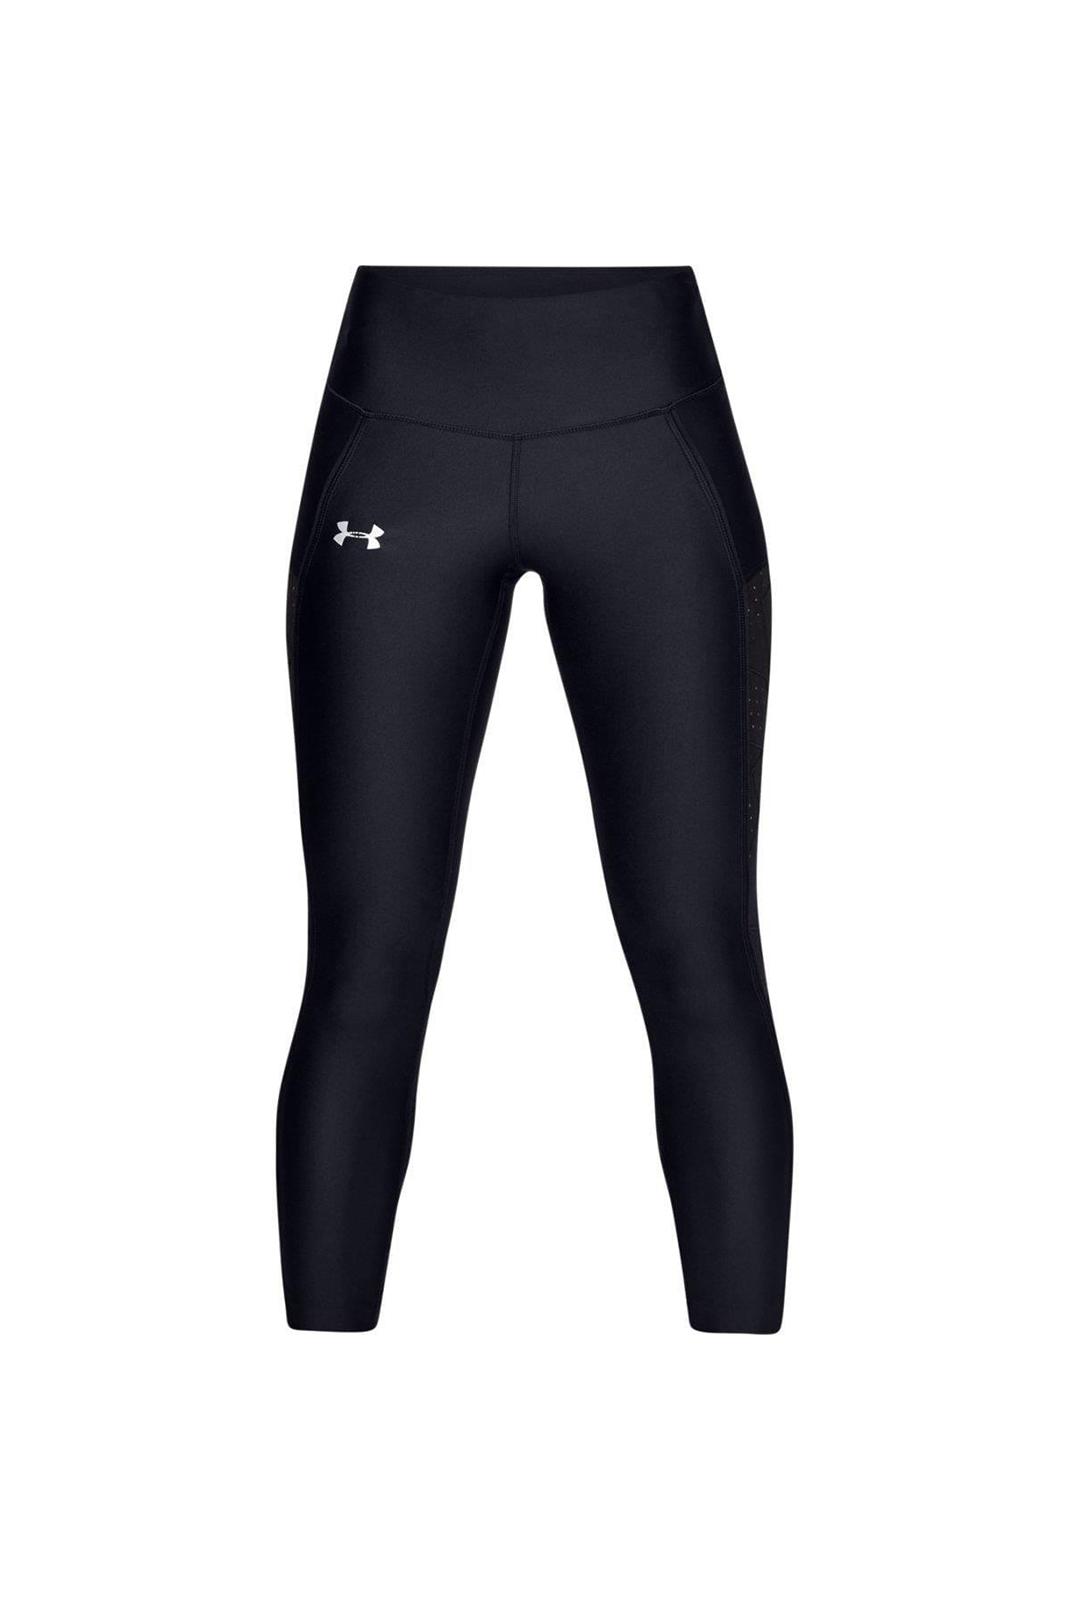 Pantalons  Under armour UA1326521 001-BLACK